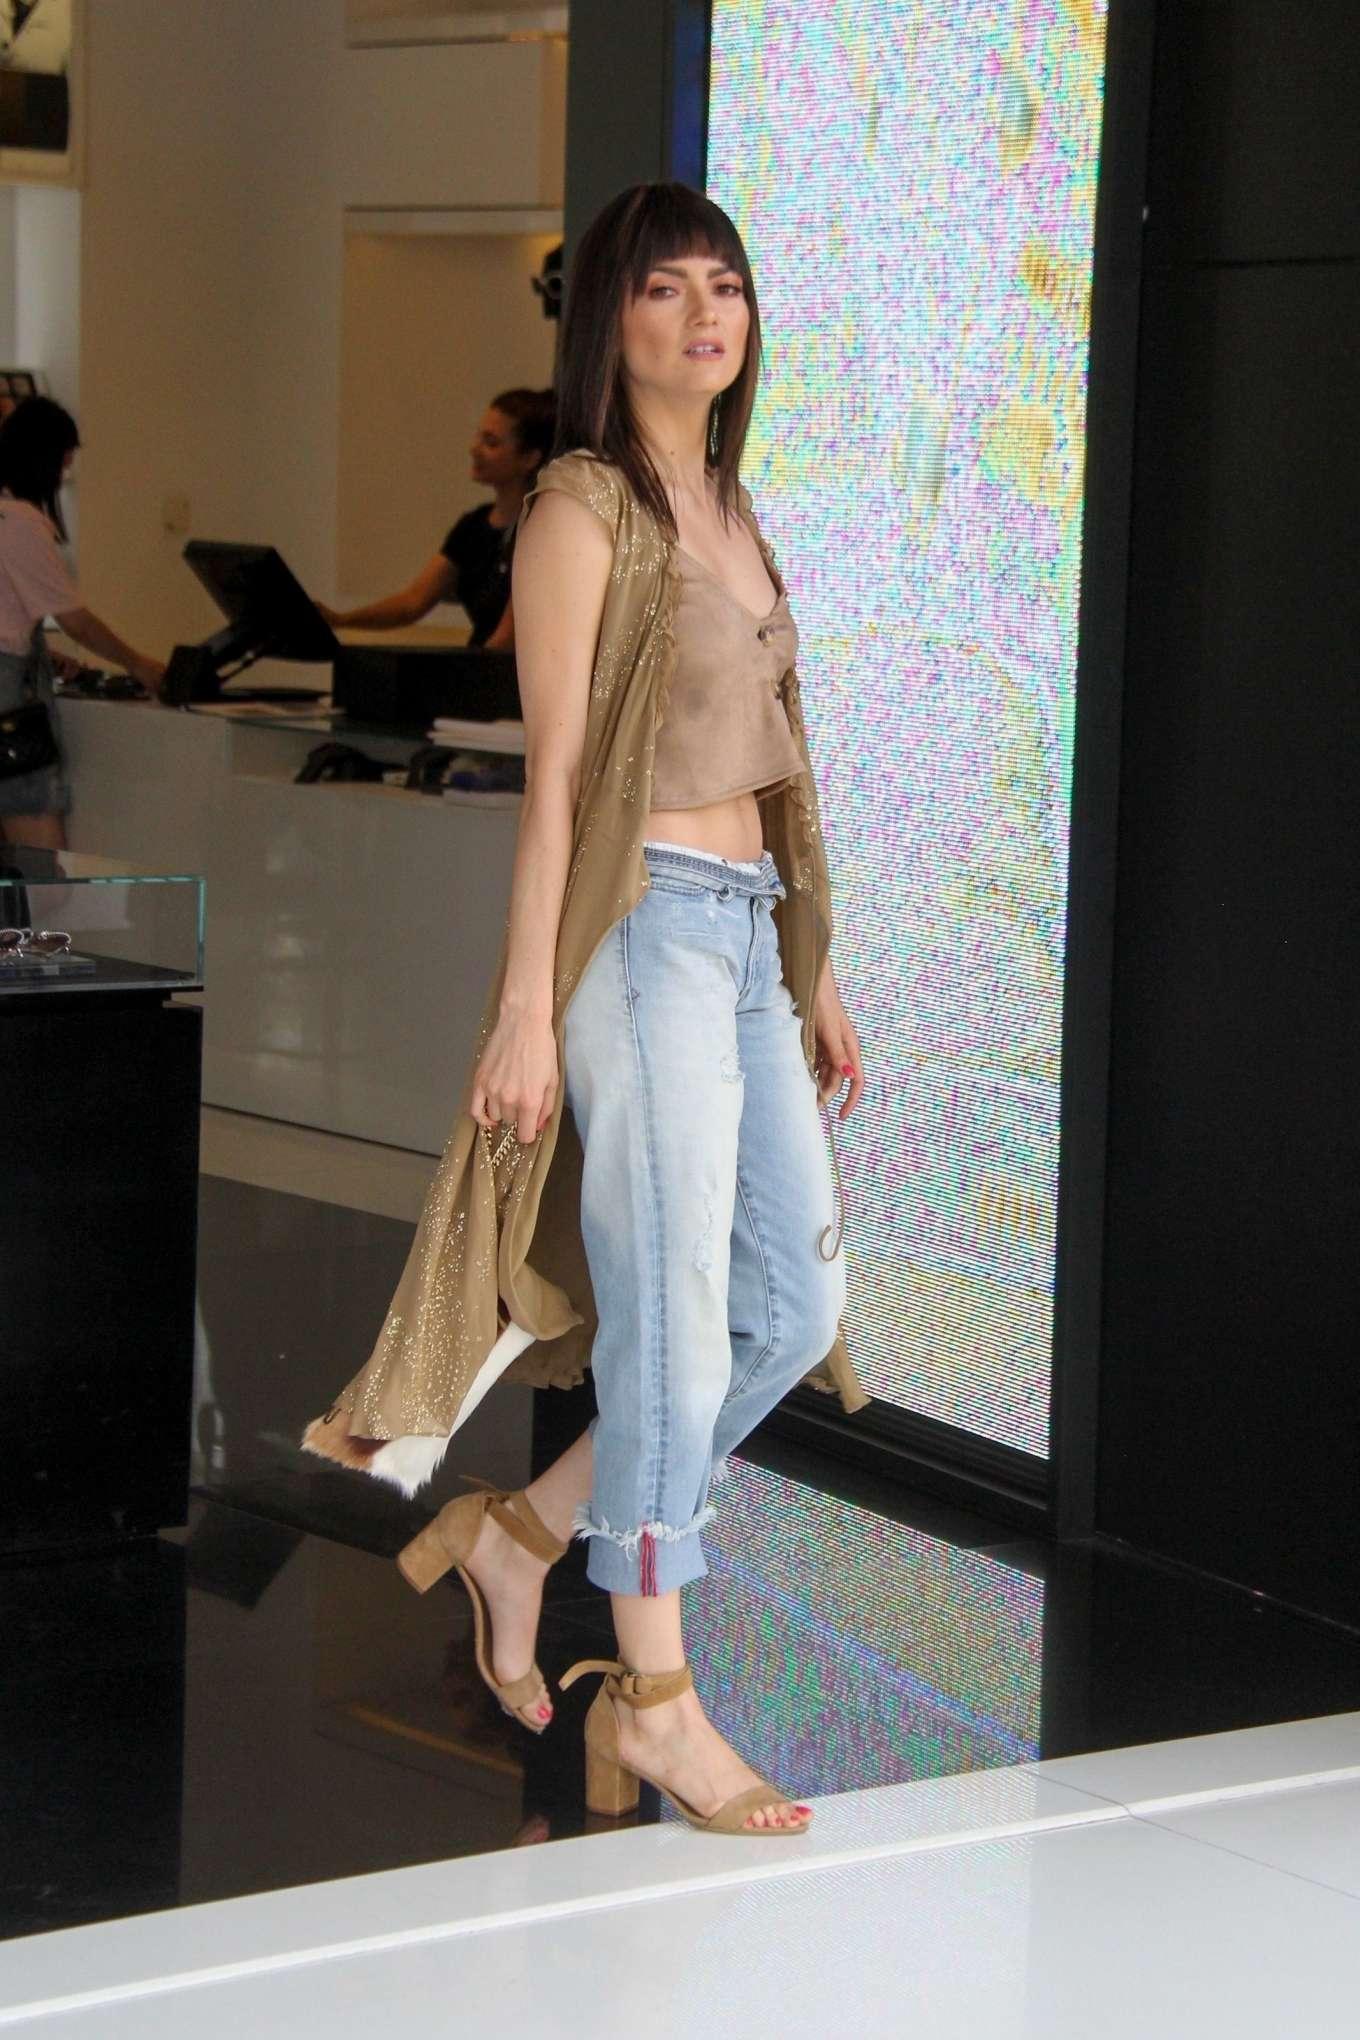 Blanca Blanco 2019 : Blanca Blanco: Shopping at Chanel on Robertson Blvd-07